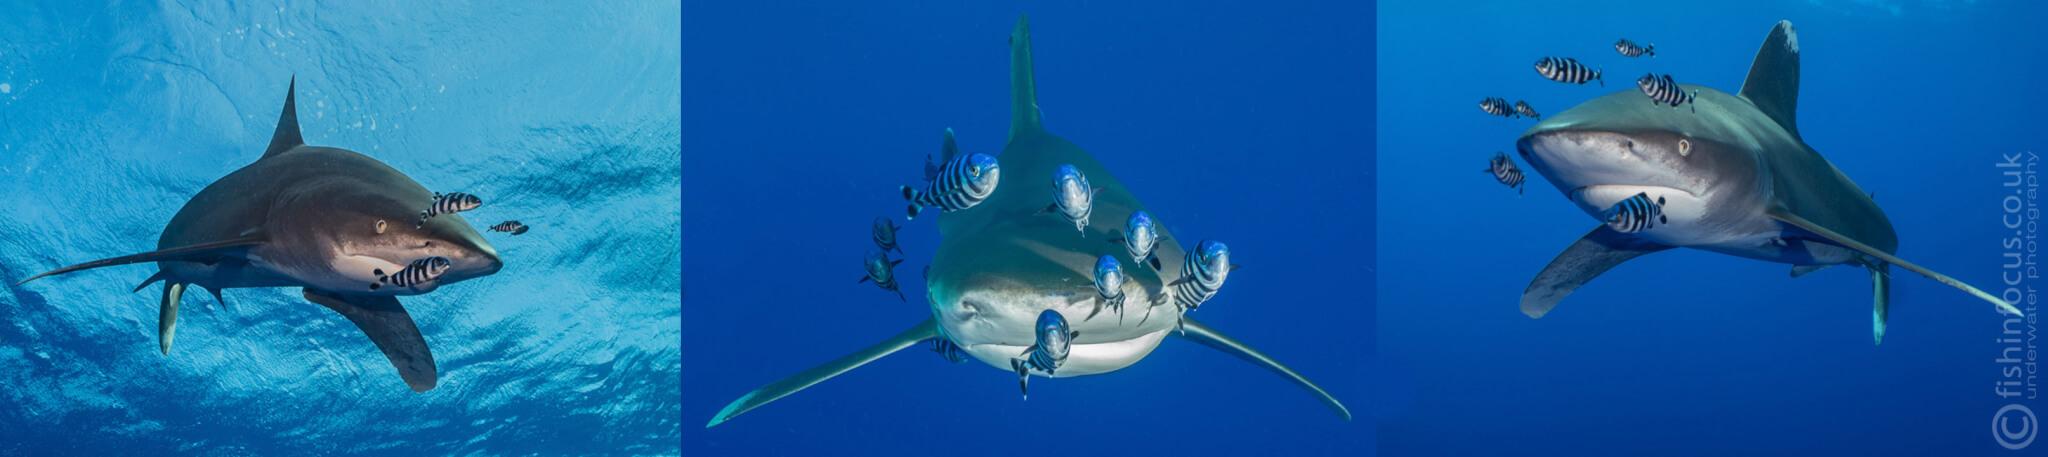 Oceanic whitetips, Hurricane, Scuba Travel, Shark Quest Photography, Mario Vitalini, fishinfocus